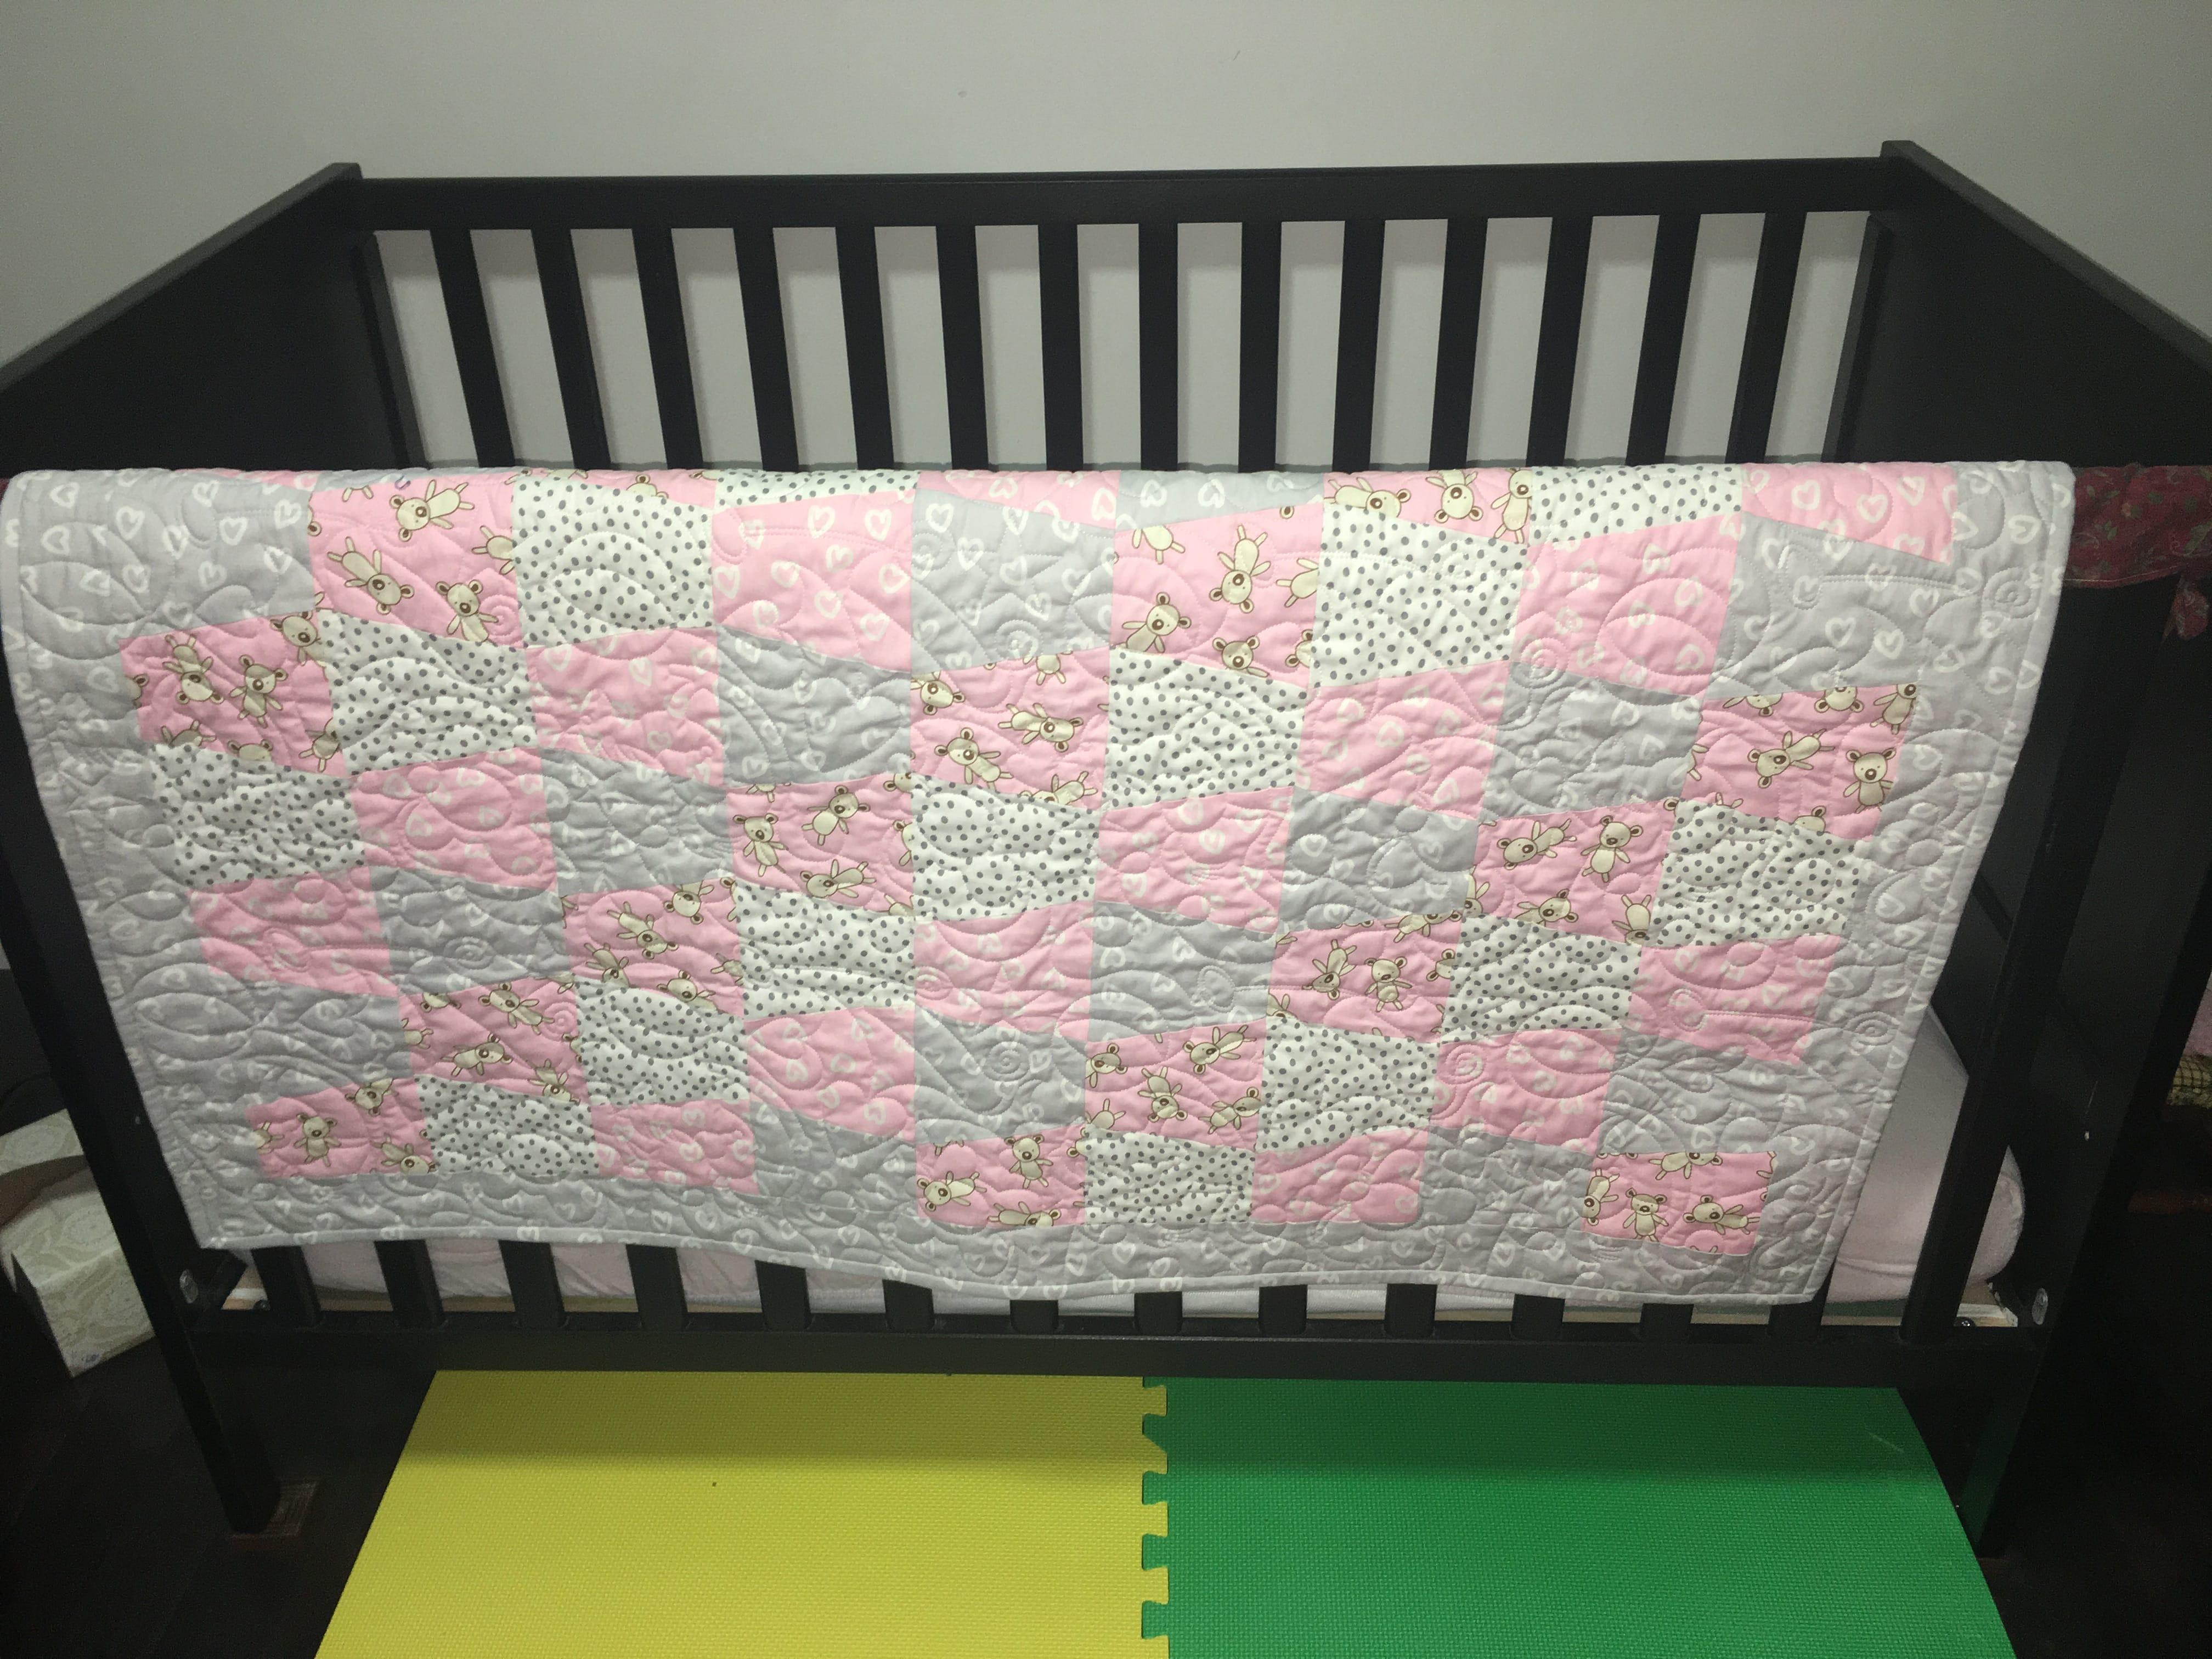 pinkTumblerCrib